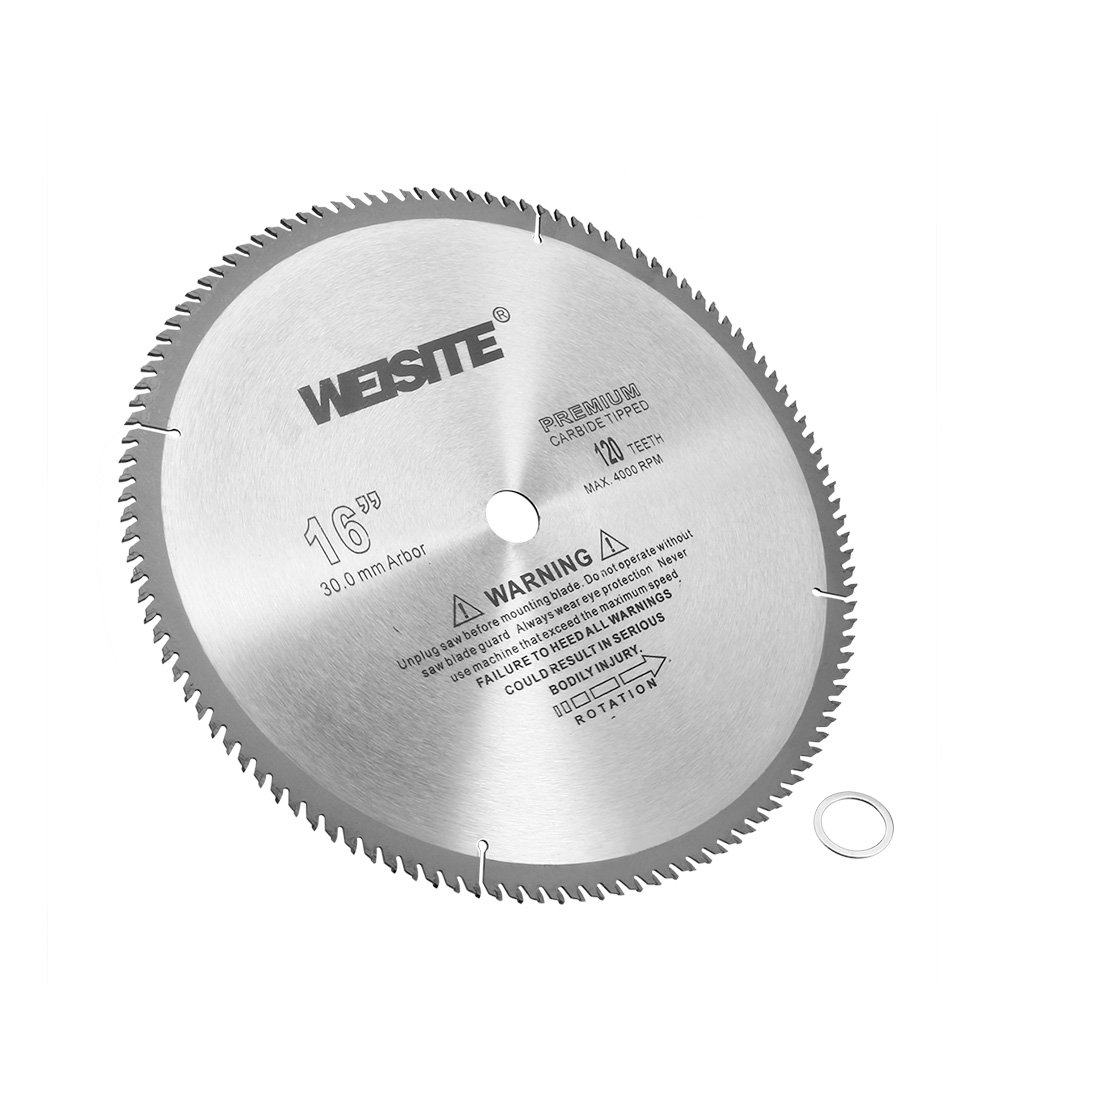 uxcell 16-Inch 120T 4000RPM TCT Premium Carbide Tip Circular Saw Blade w 1-inch Arbor